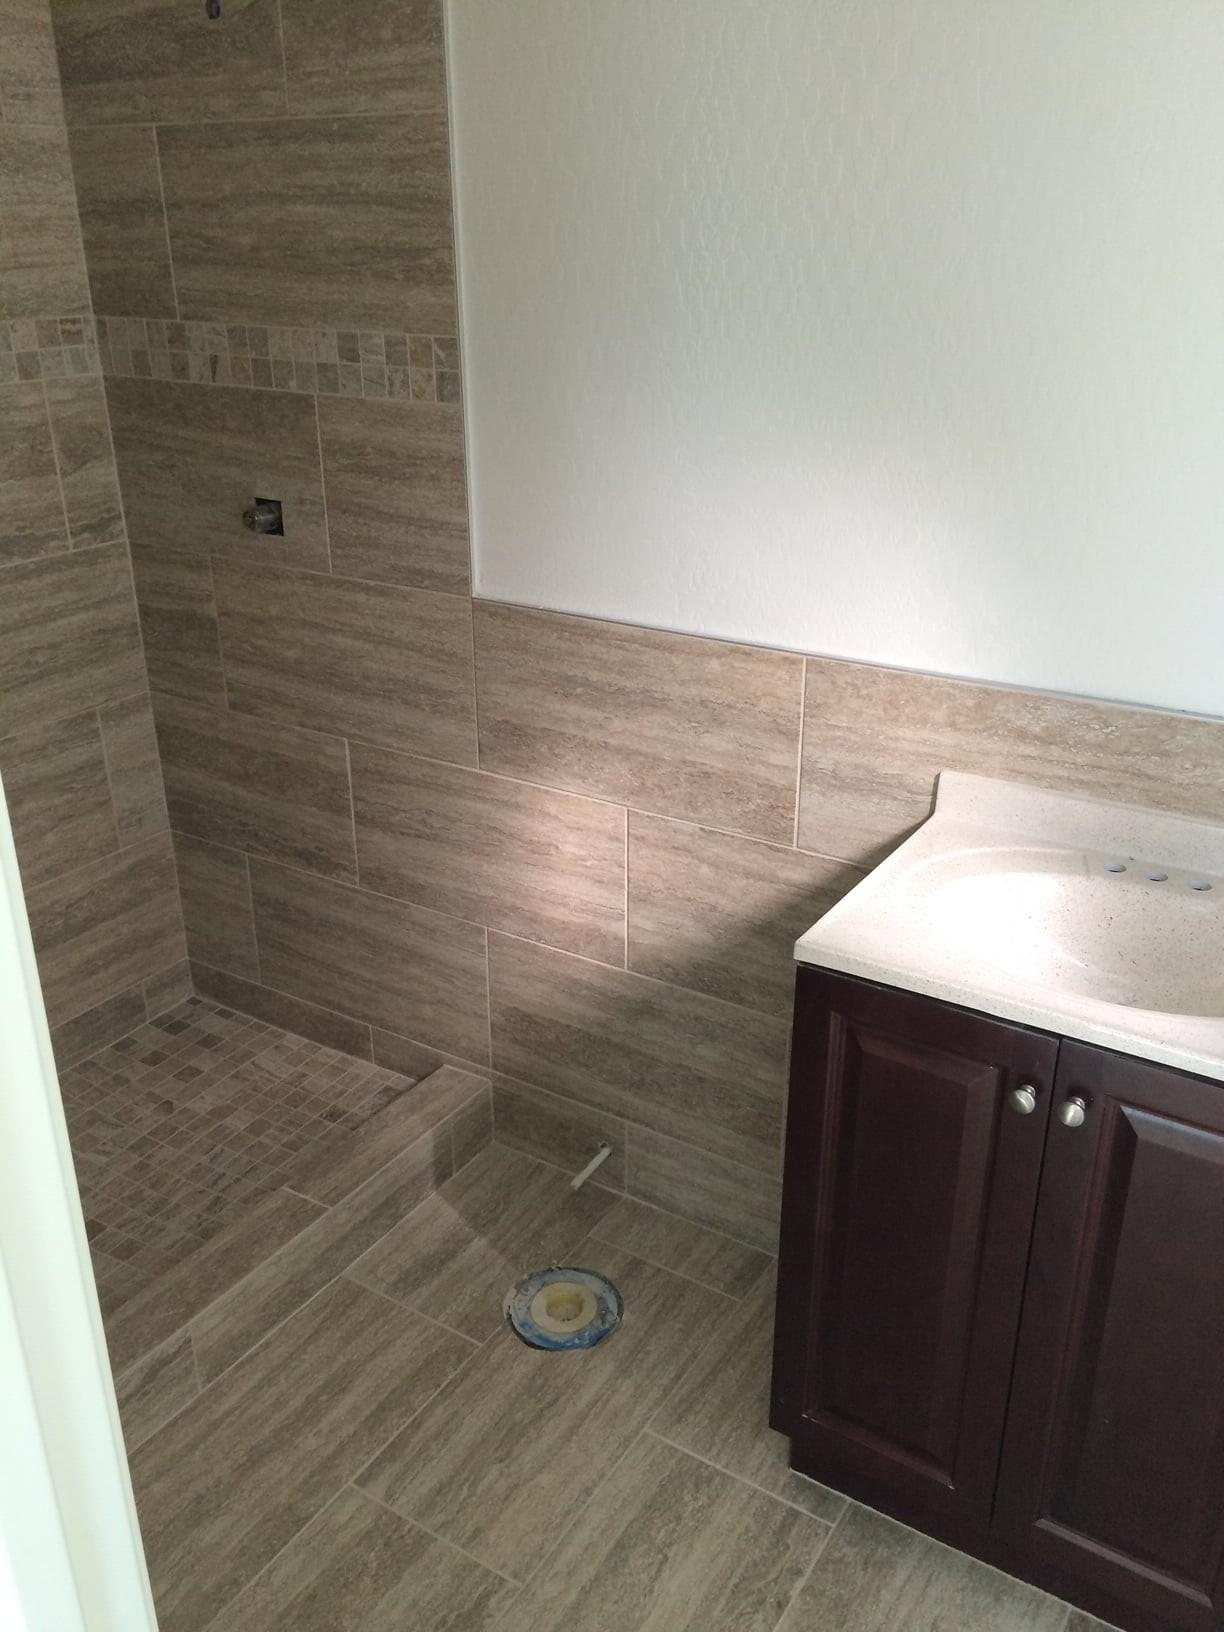 Custom tile bathroom installation in Sun City, AZ from Cornerstone Flooring Brokers